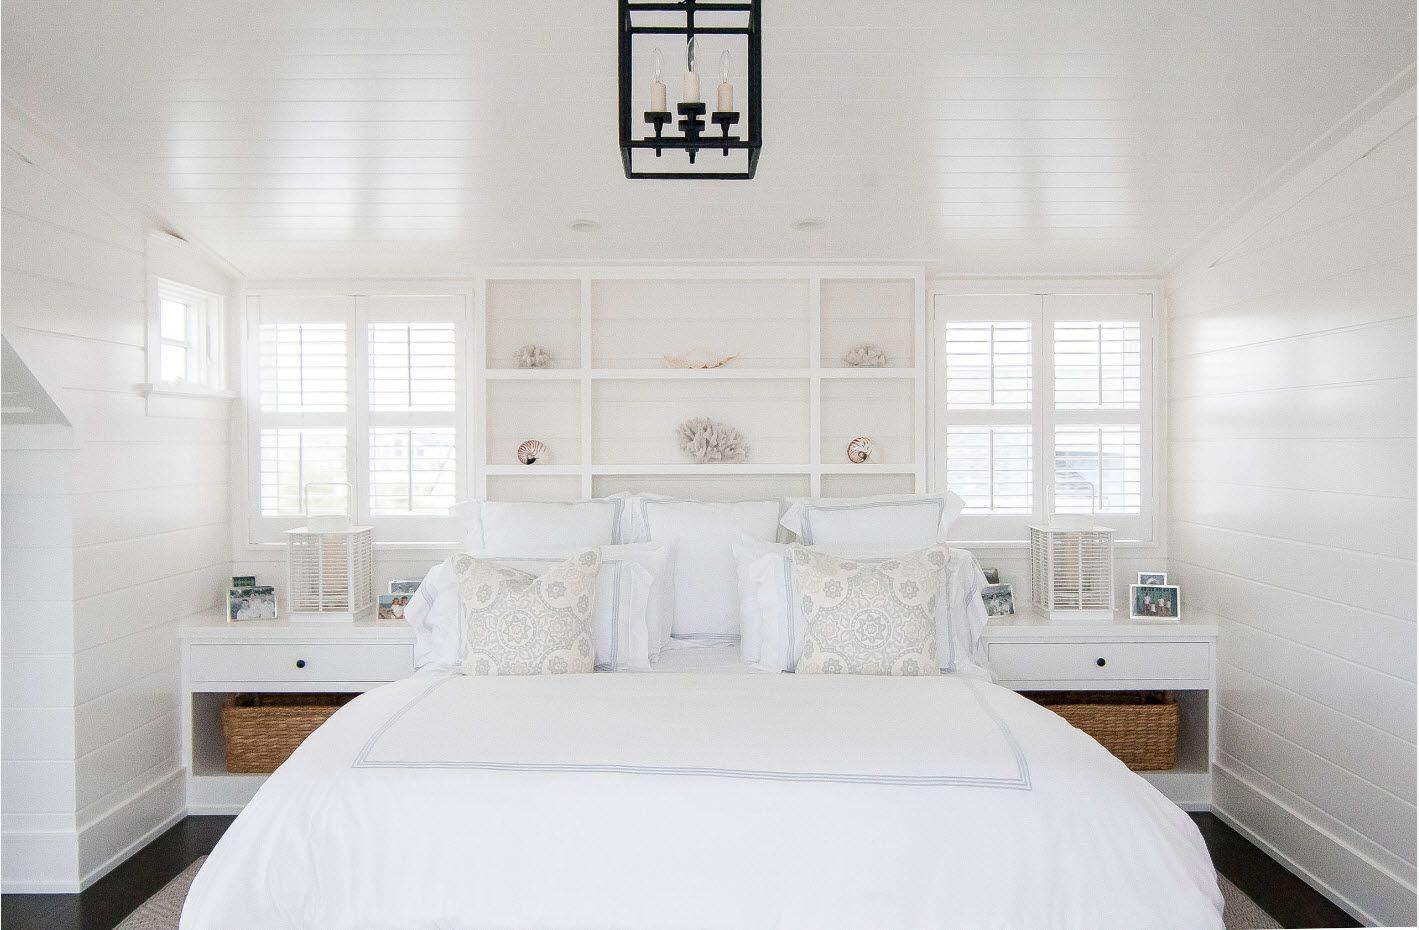 Modern Bedroom Interior Decoration & Design Ideas 2017. Absolutely white idyll